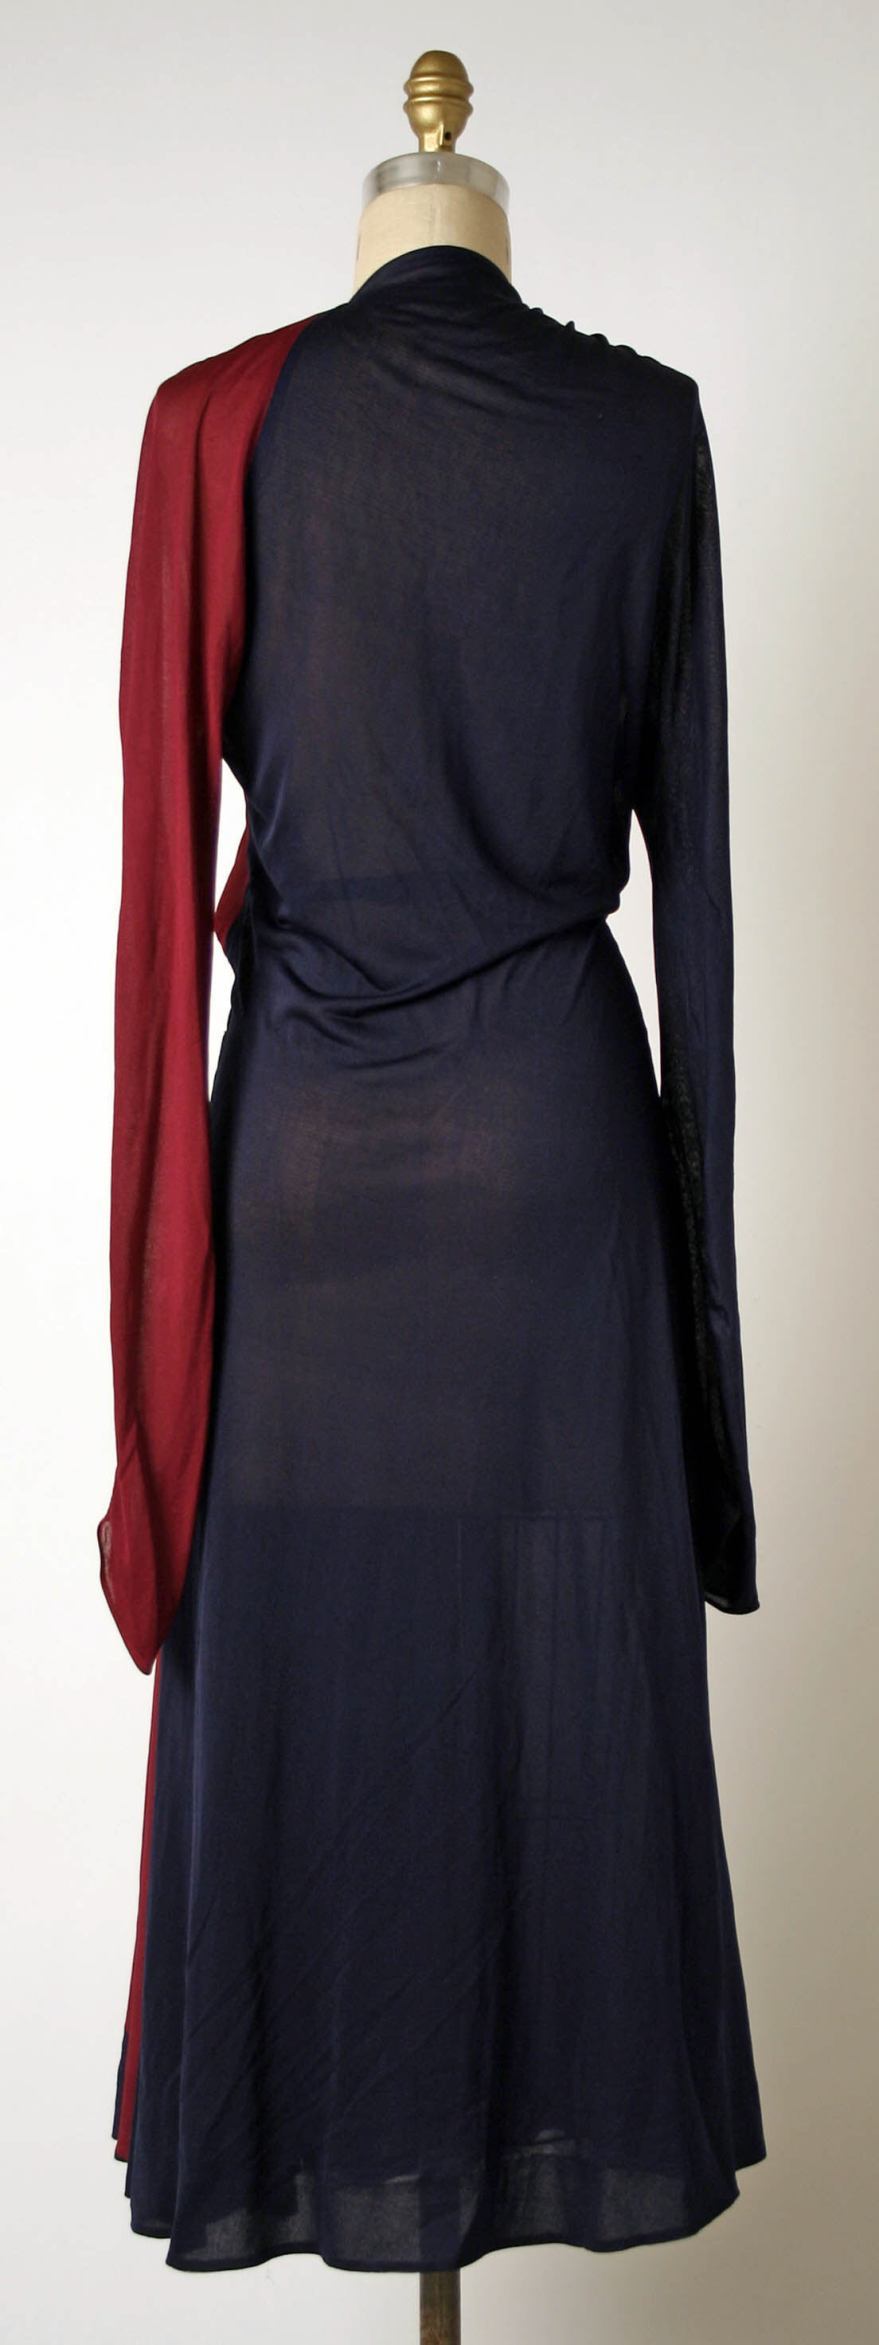 Afternoon dress Madame Grès (Alix Barton) (French, Paris 1903–1993 Var region)2